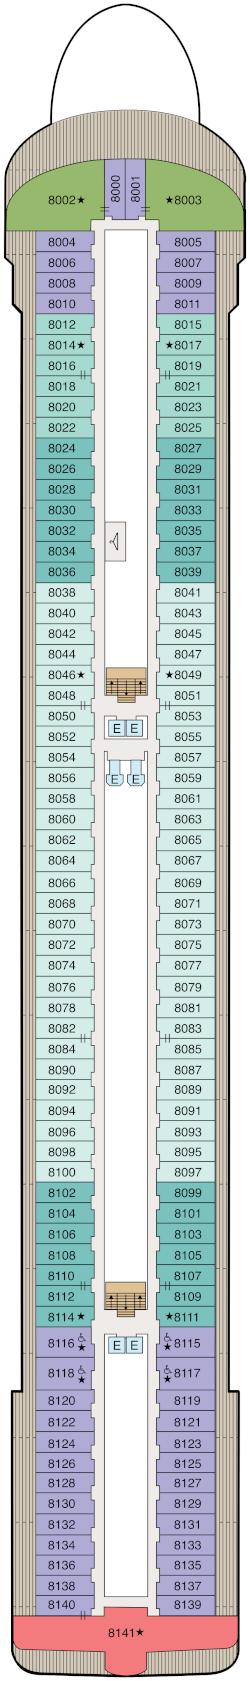 Vista Deck 8 Deck Plan